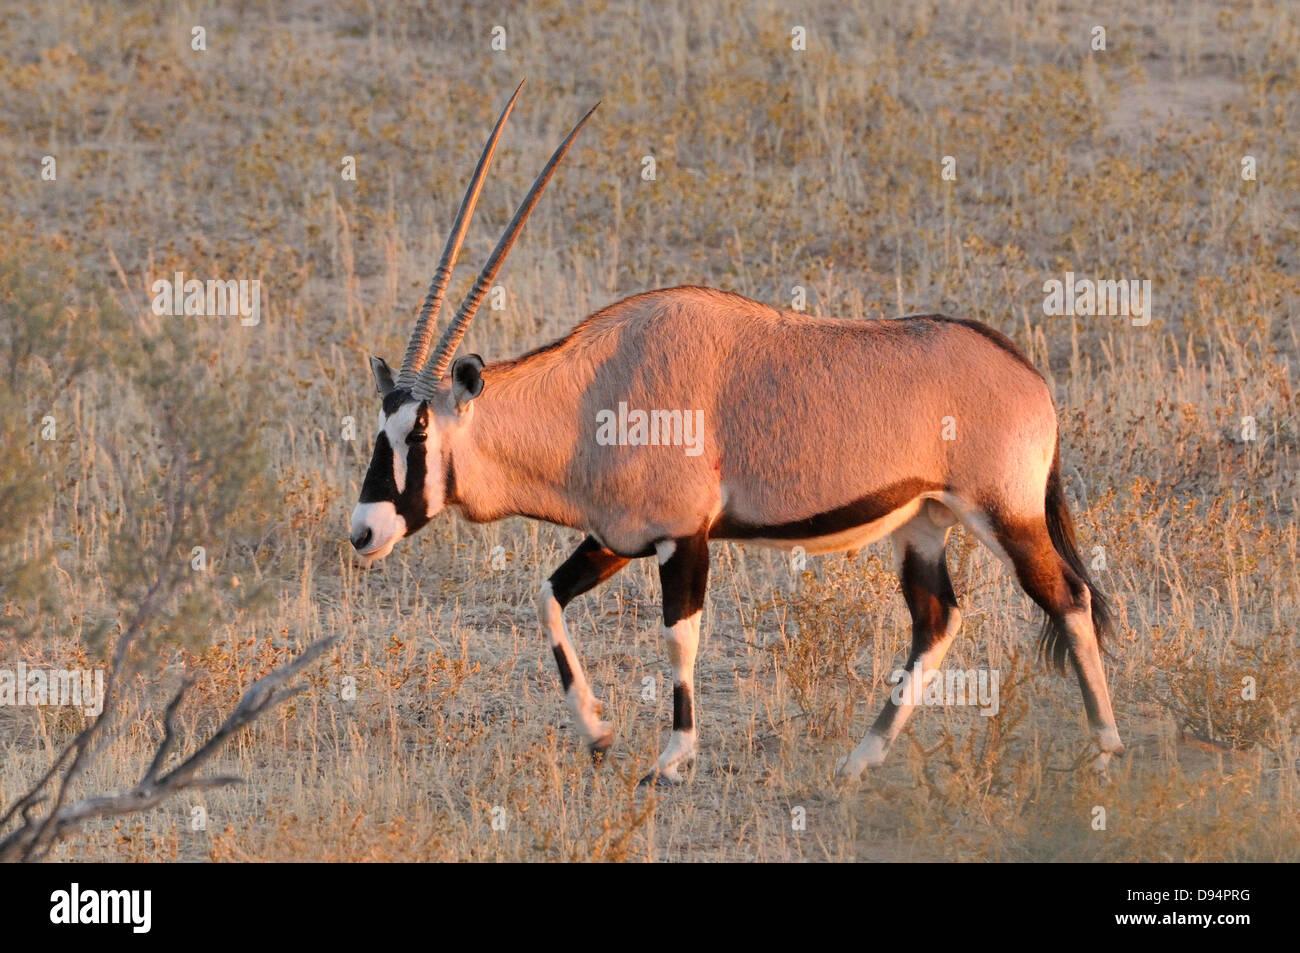 Southern Oryx (Gemsbok) Oryx gazella,  Photographed in Kgalagadi National Park, South Africa - Stock Image